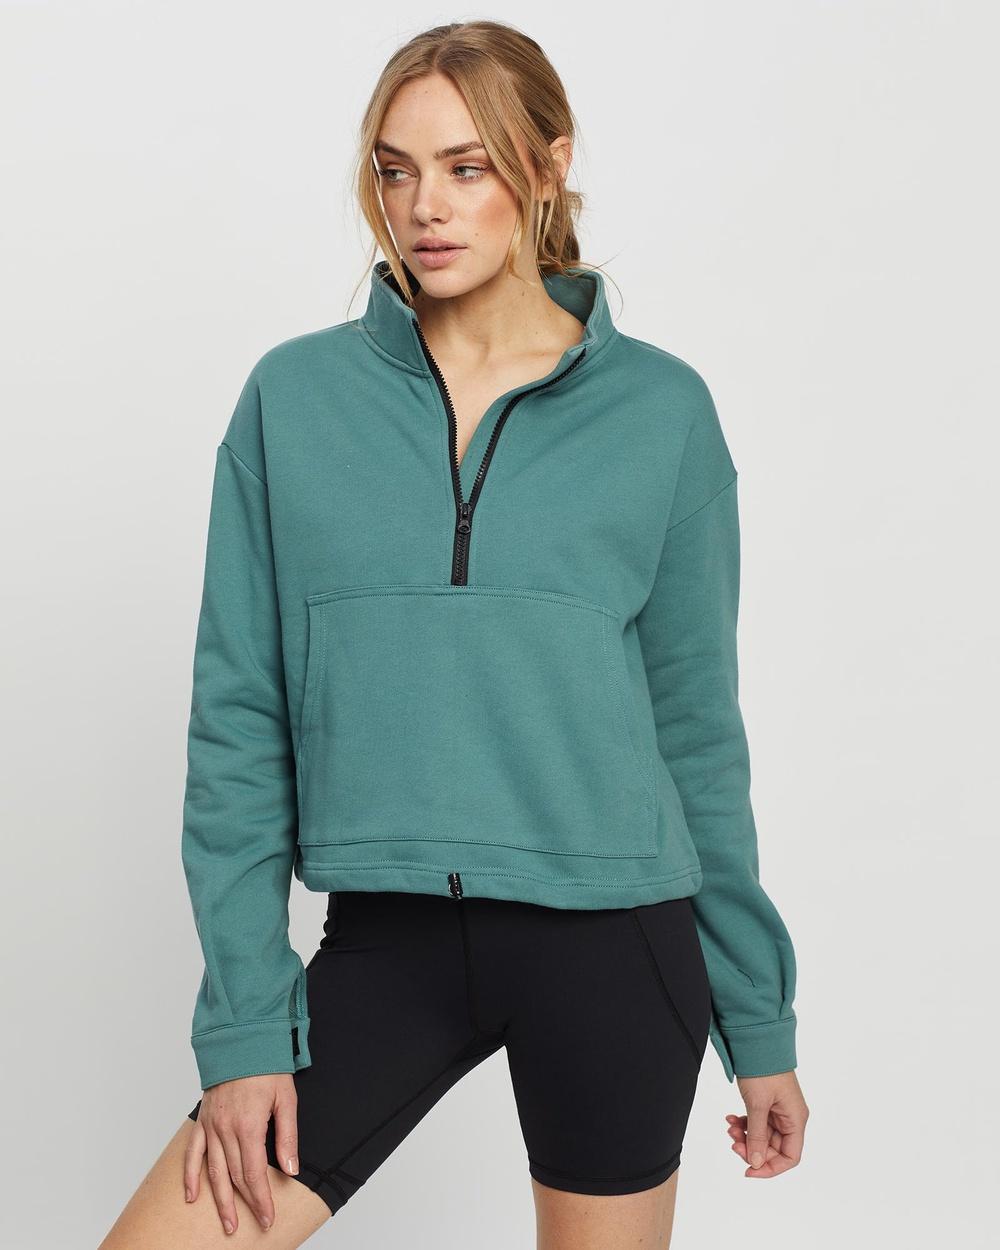 All Fenix Erin Zipper Sweater Sweats Teal